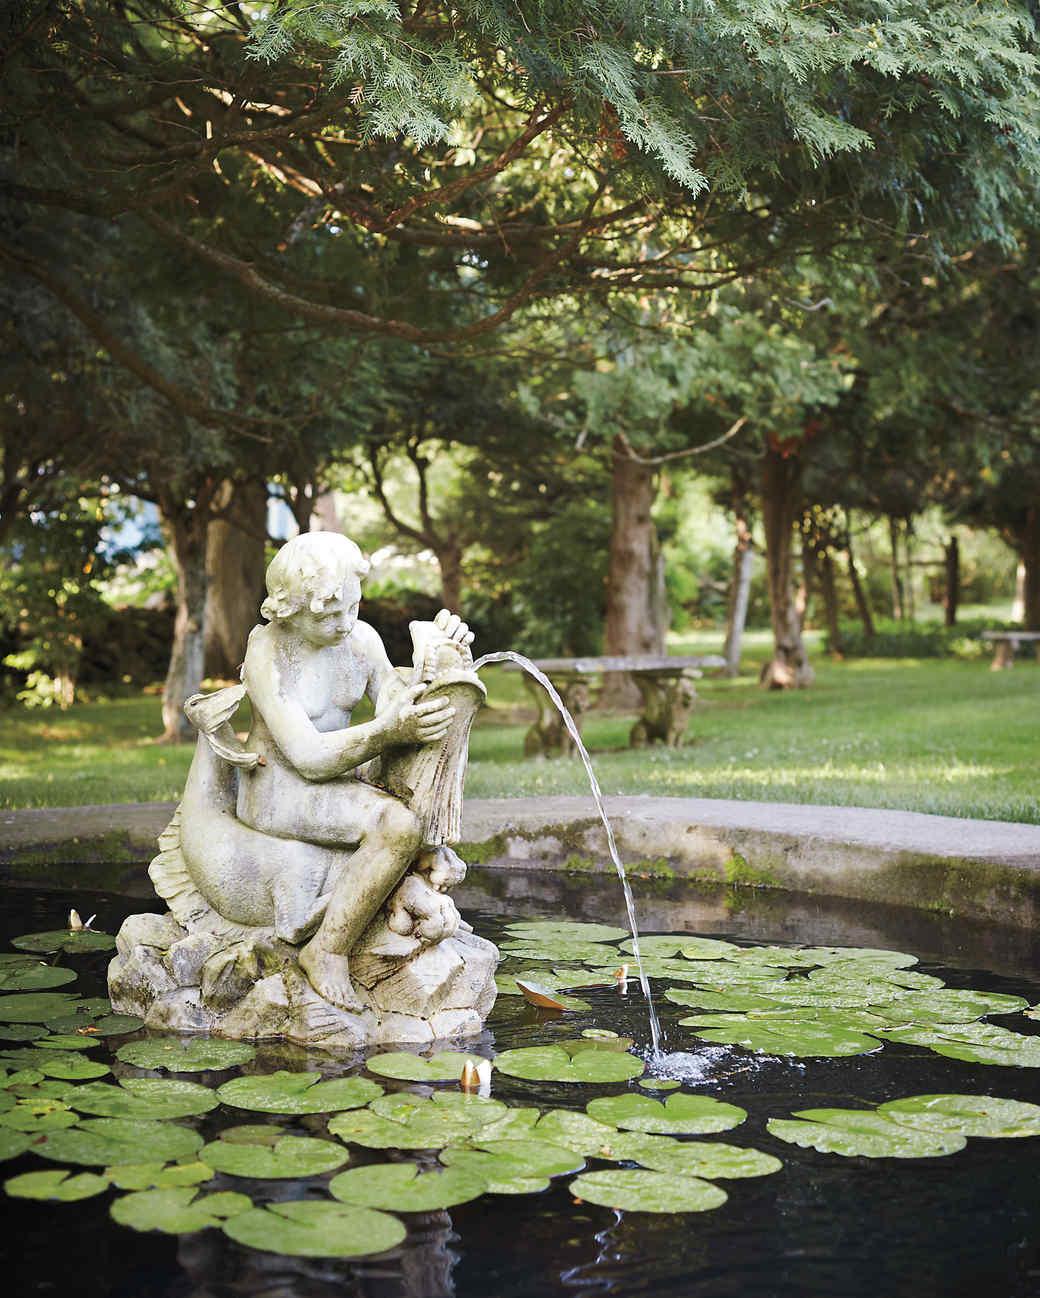 meadowburn-farm-pool-fountain-169-d111449.jpg